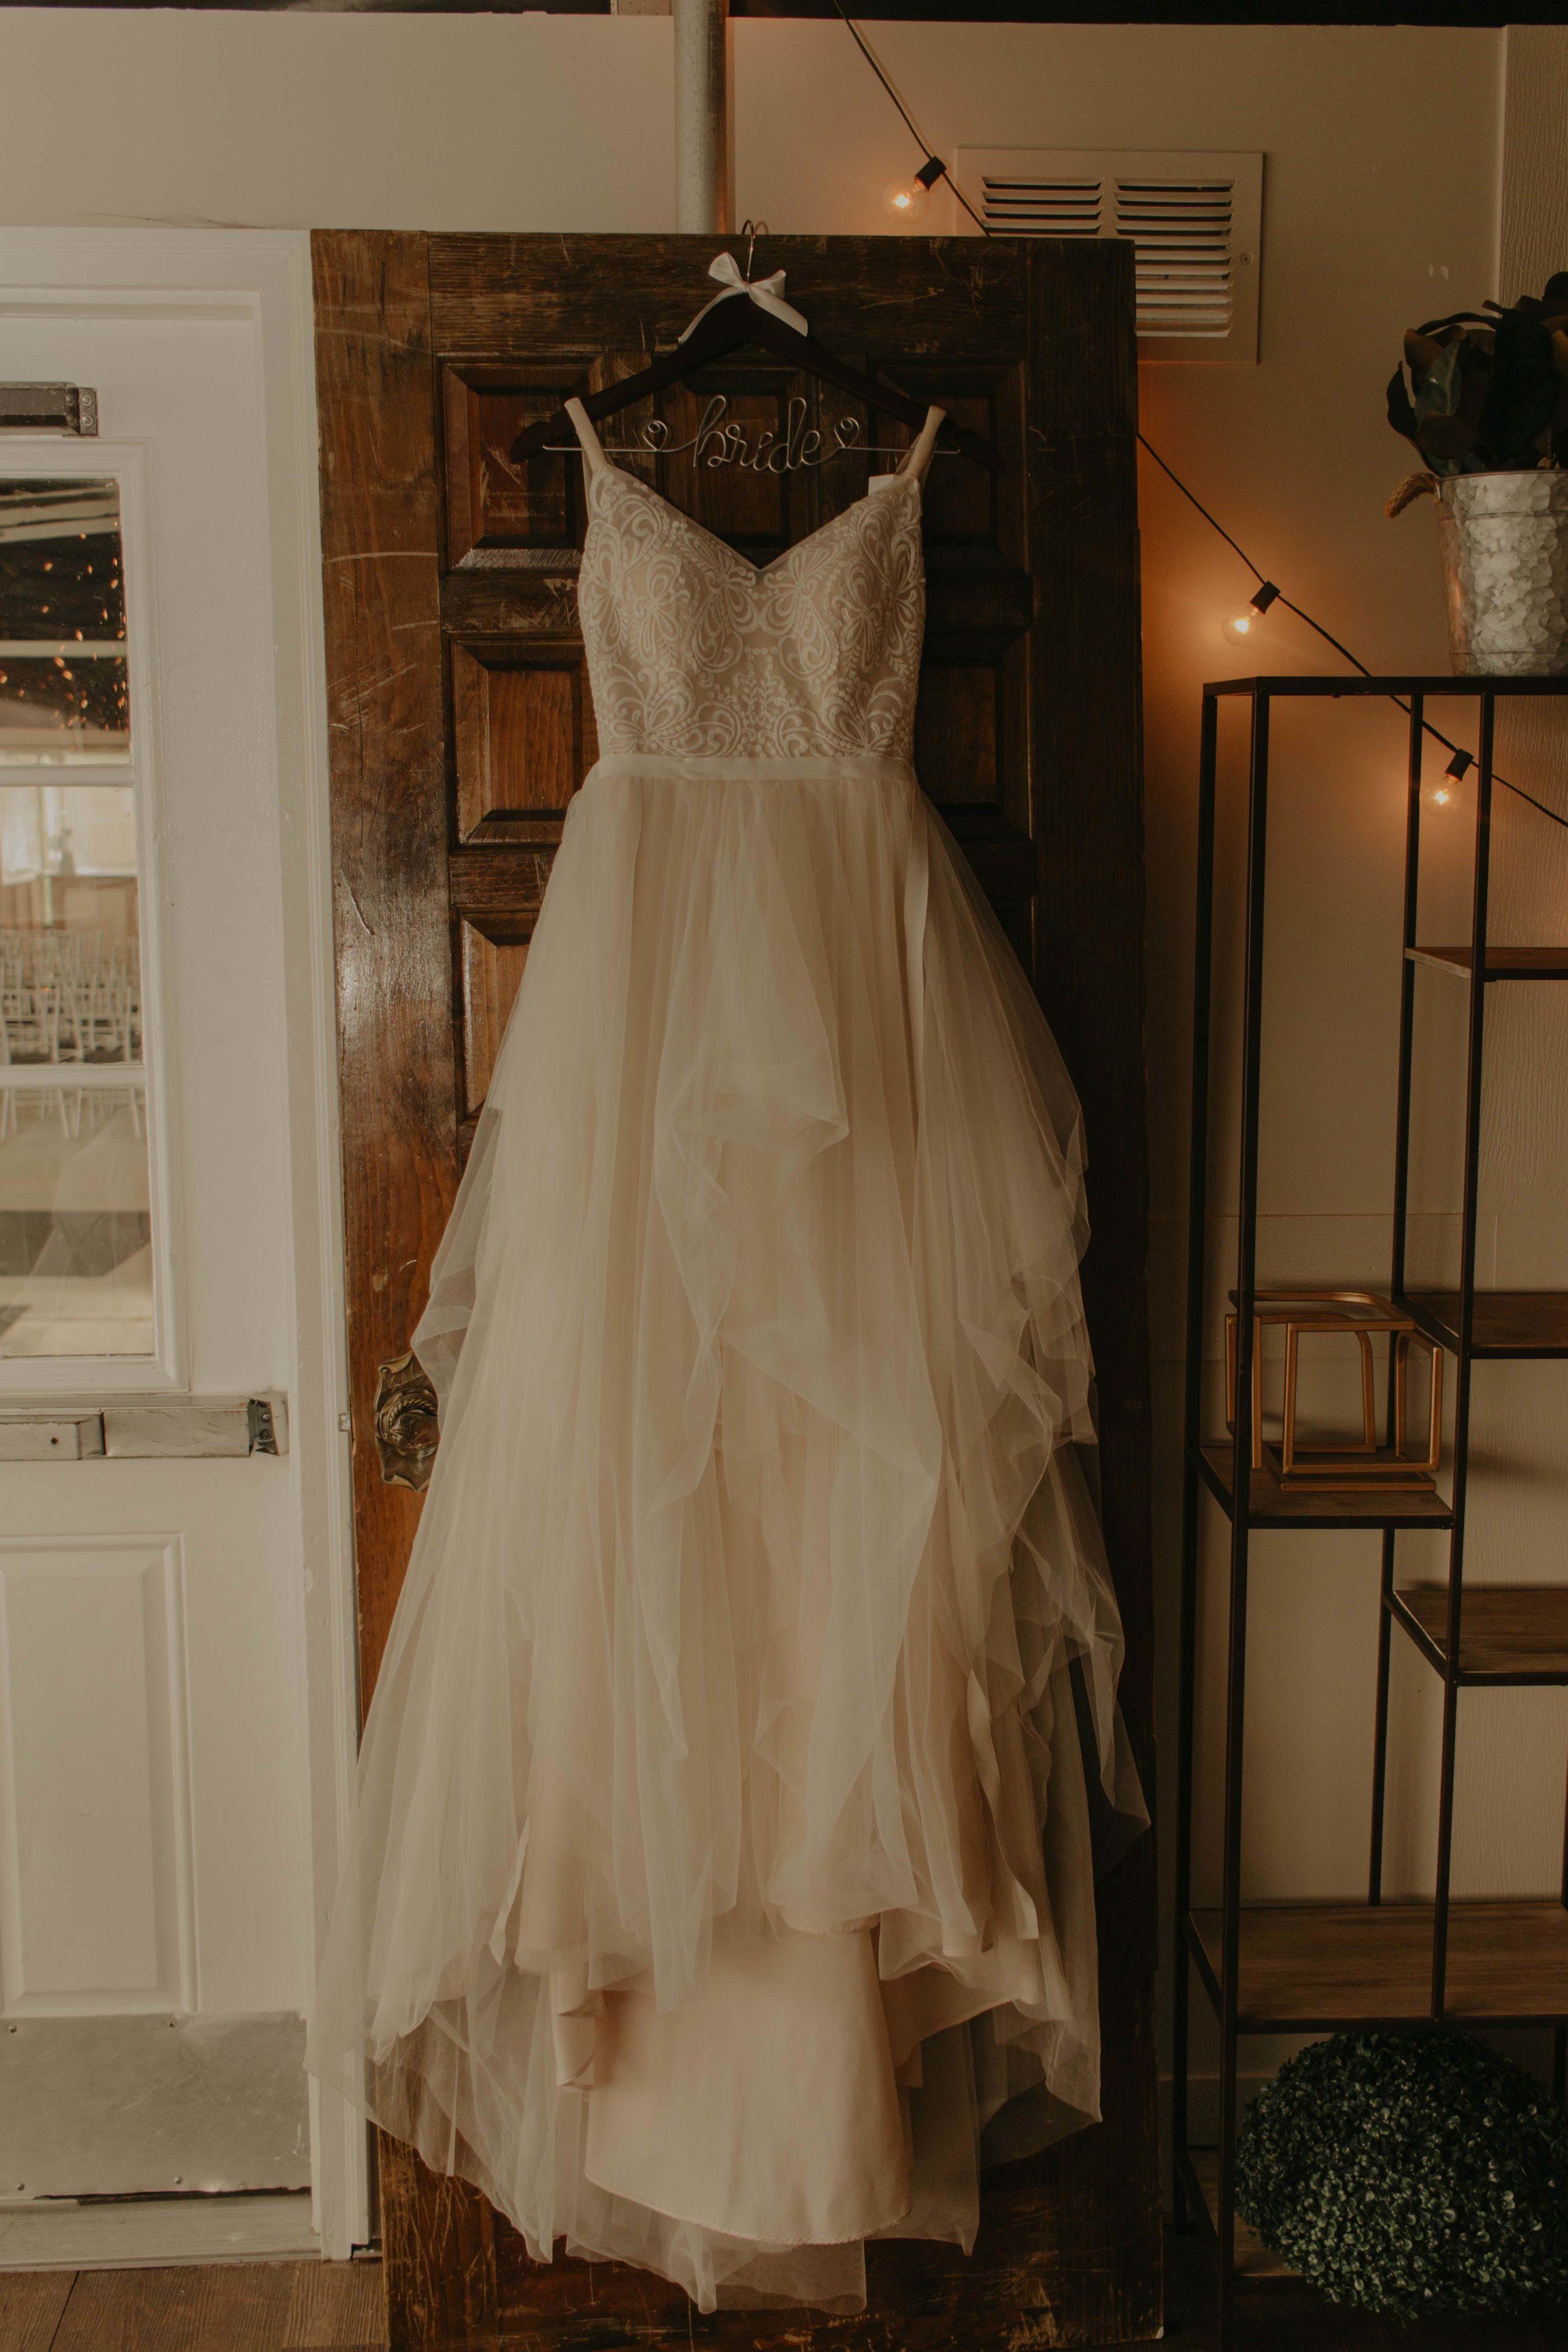 Bidikan gantung gaun pengantin